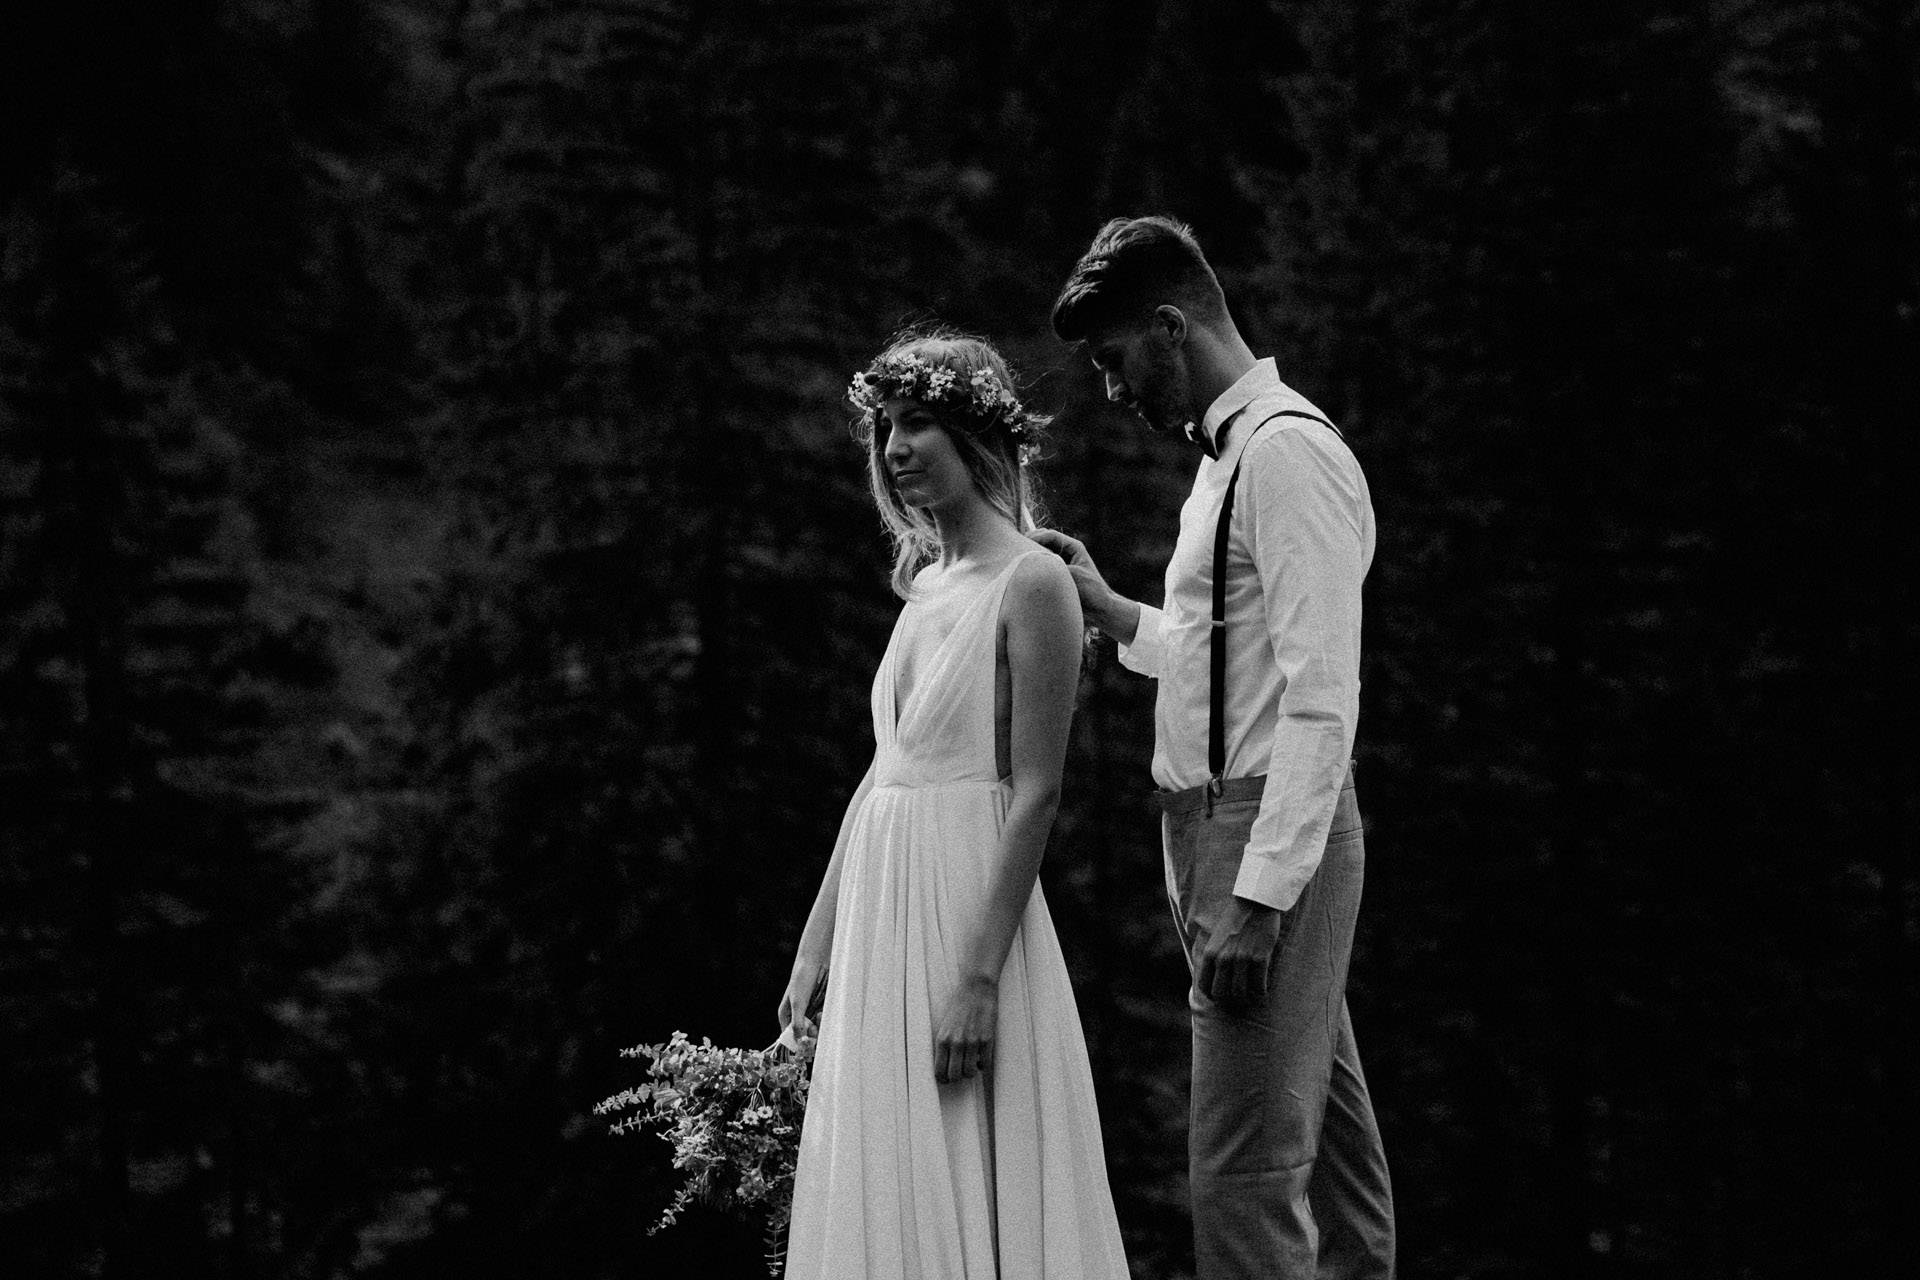 vienna-wedding-photographer-agnesundandi-weddingshooting-schladming-33